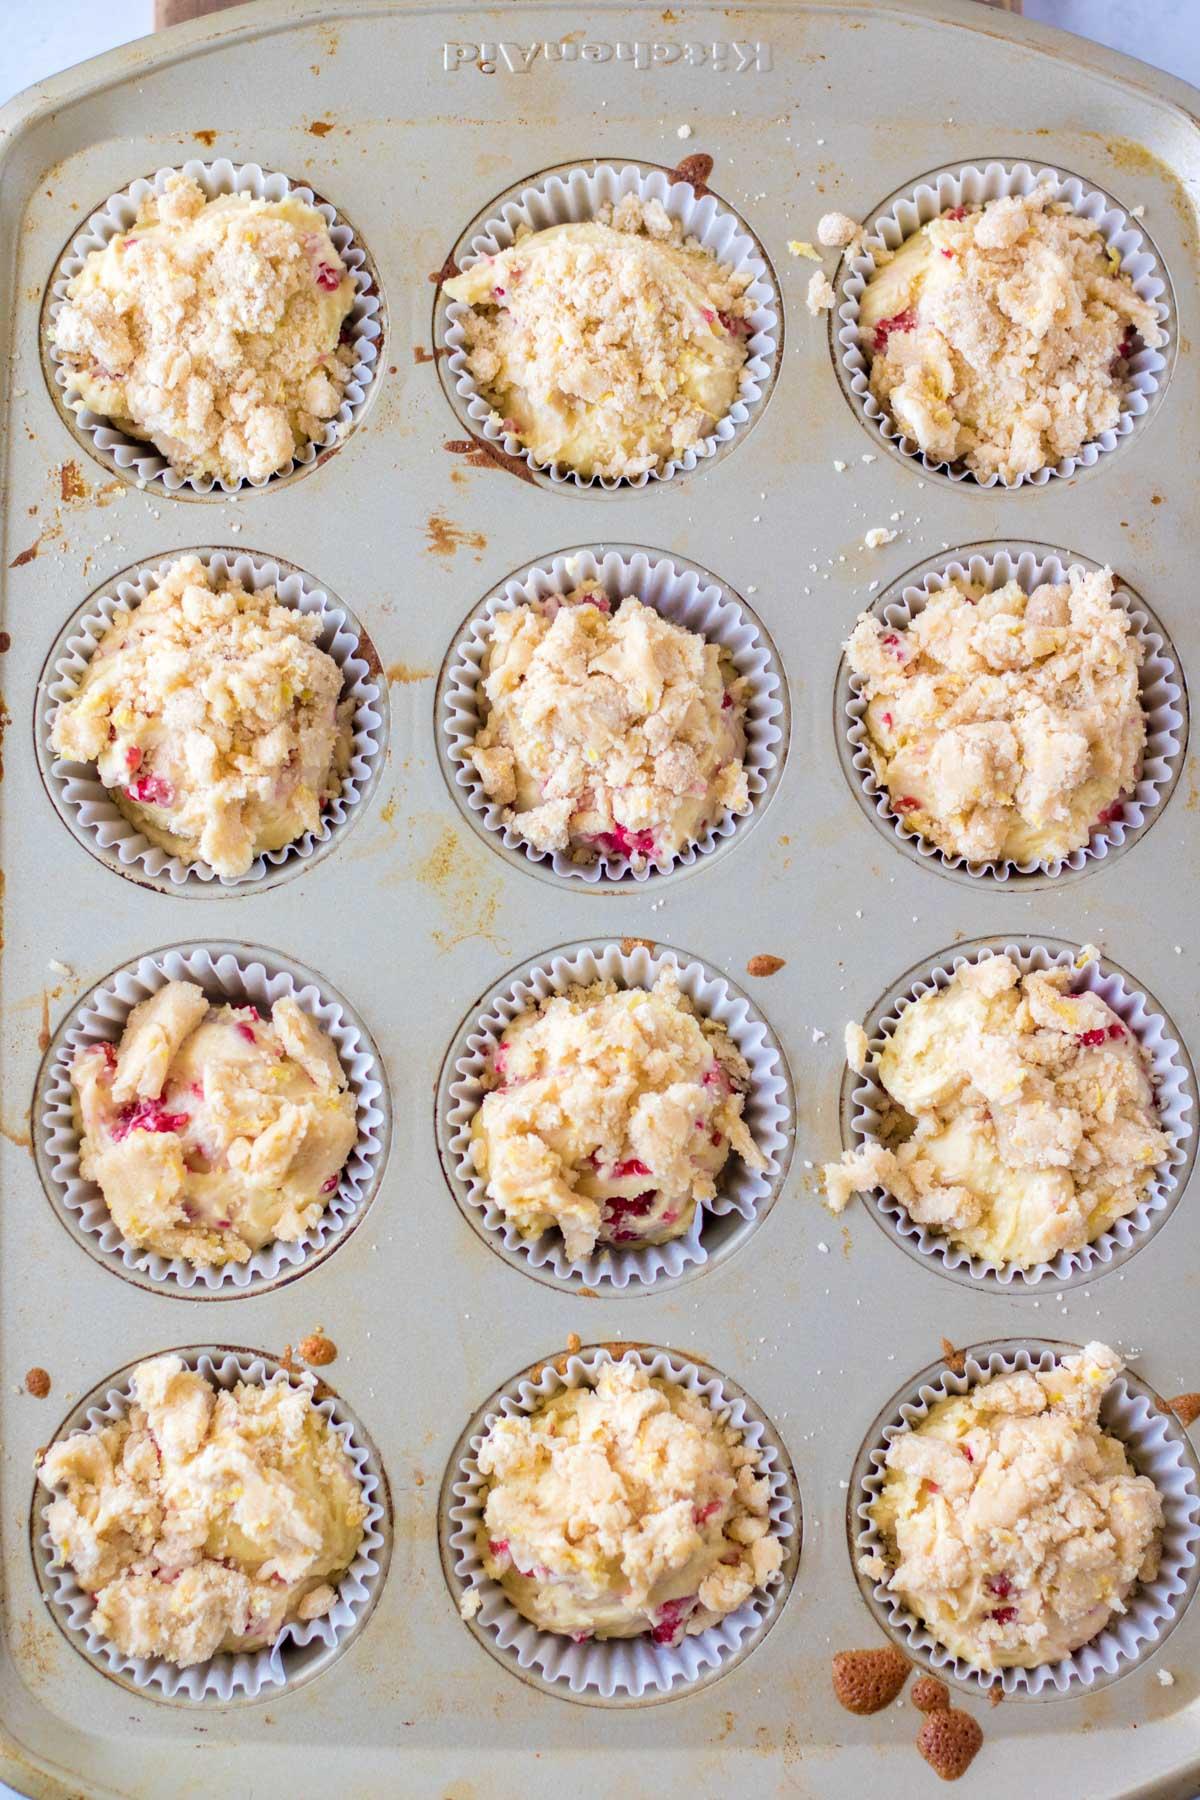 raspberry muffin batter in a muffin pan